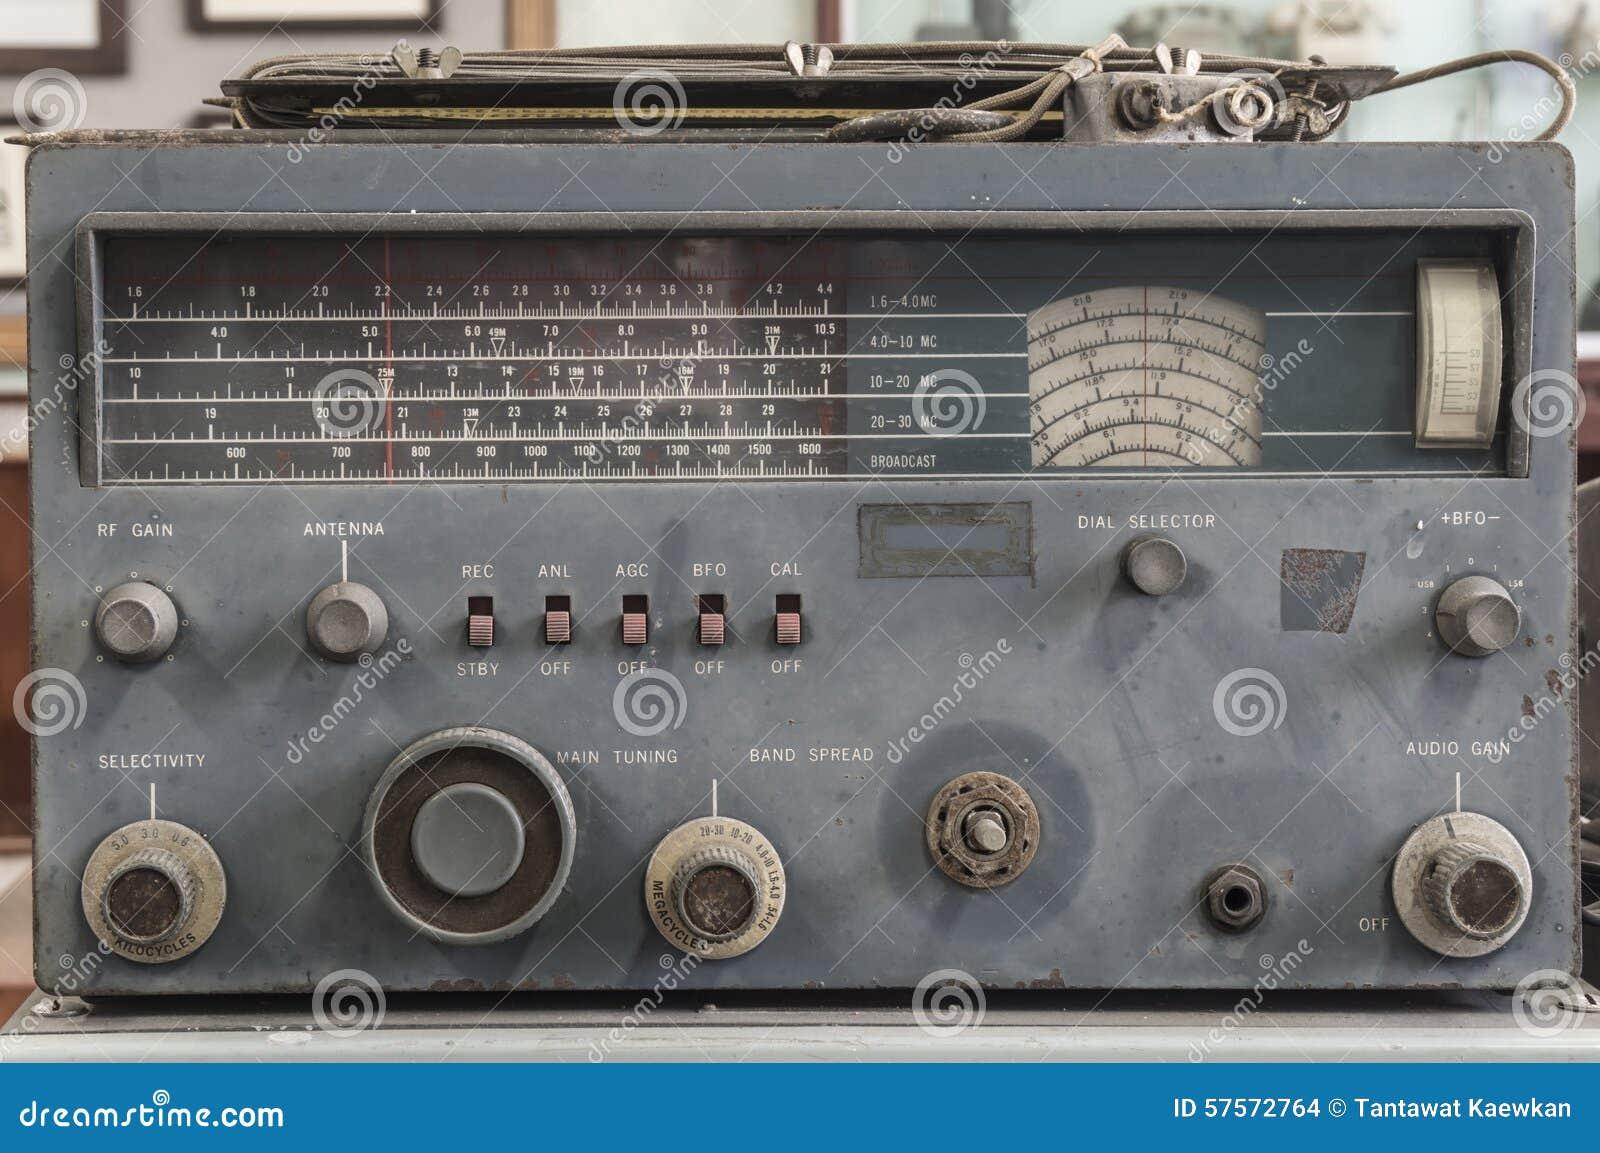 Collecting Military Radios by Ralph Hogan WB4TUR - QSLnet